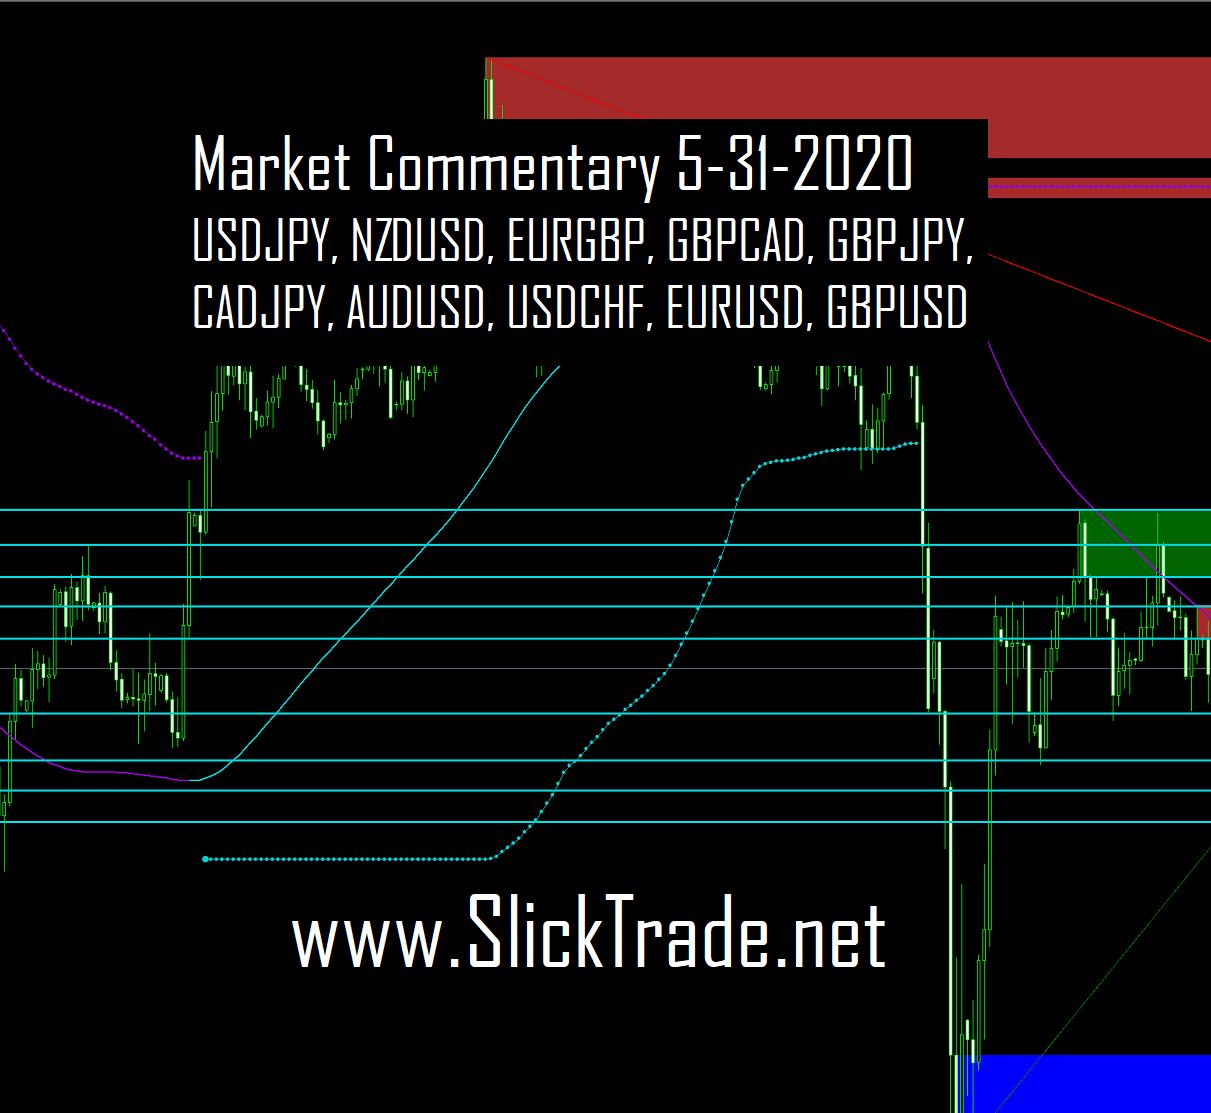 Market Commentary 5-31-2020 - USDJPY NZDUSD EURGBP GBPCAD GBPJPY CADJPY AUDUSD USDCHF EURUSD GBPUSD square